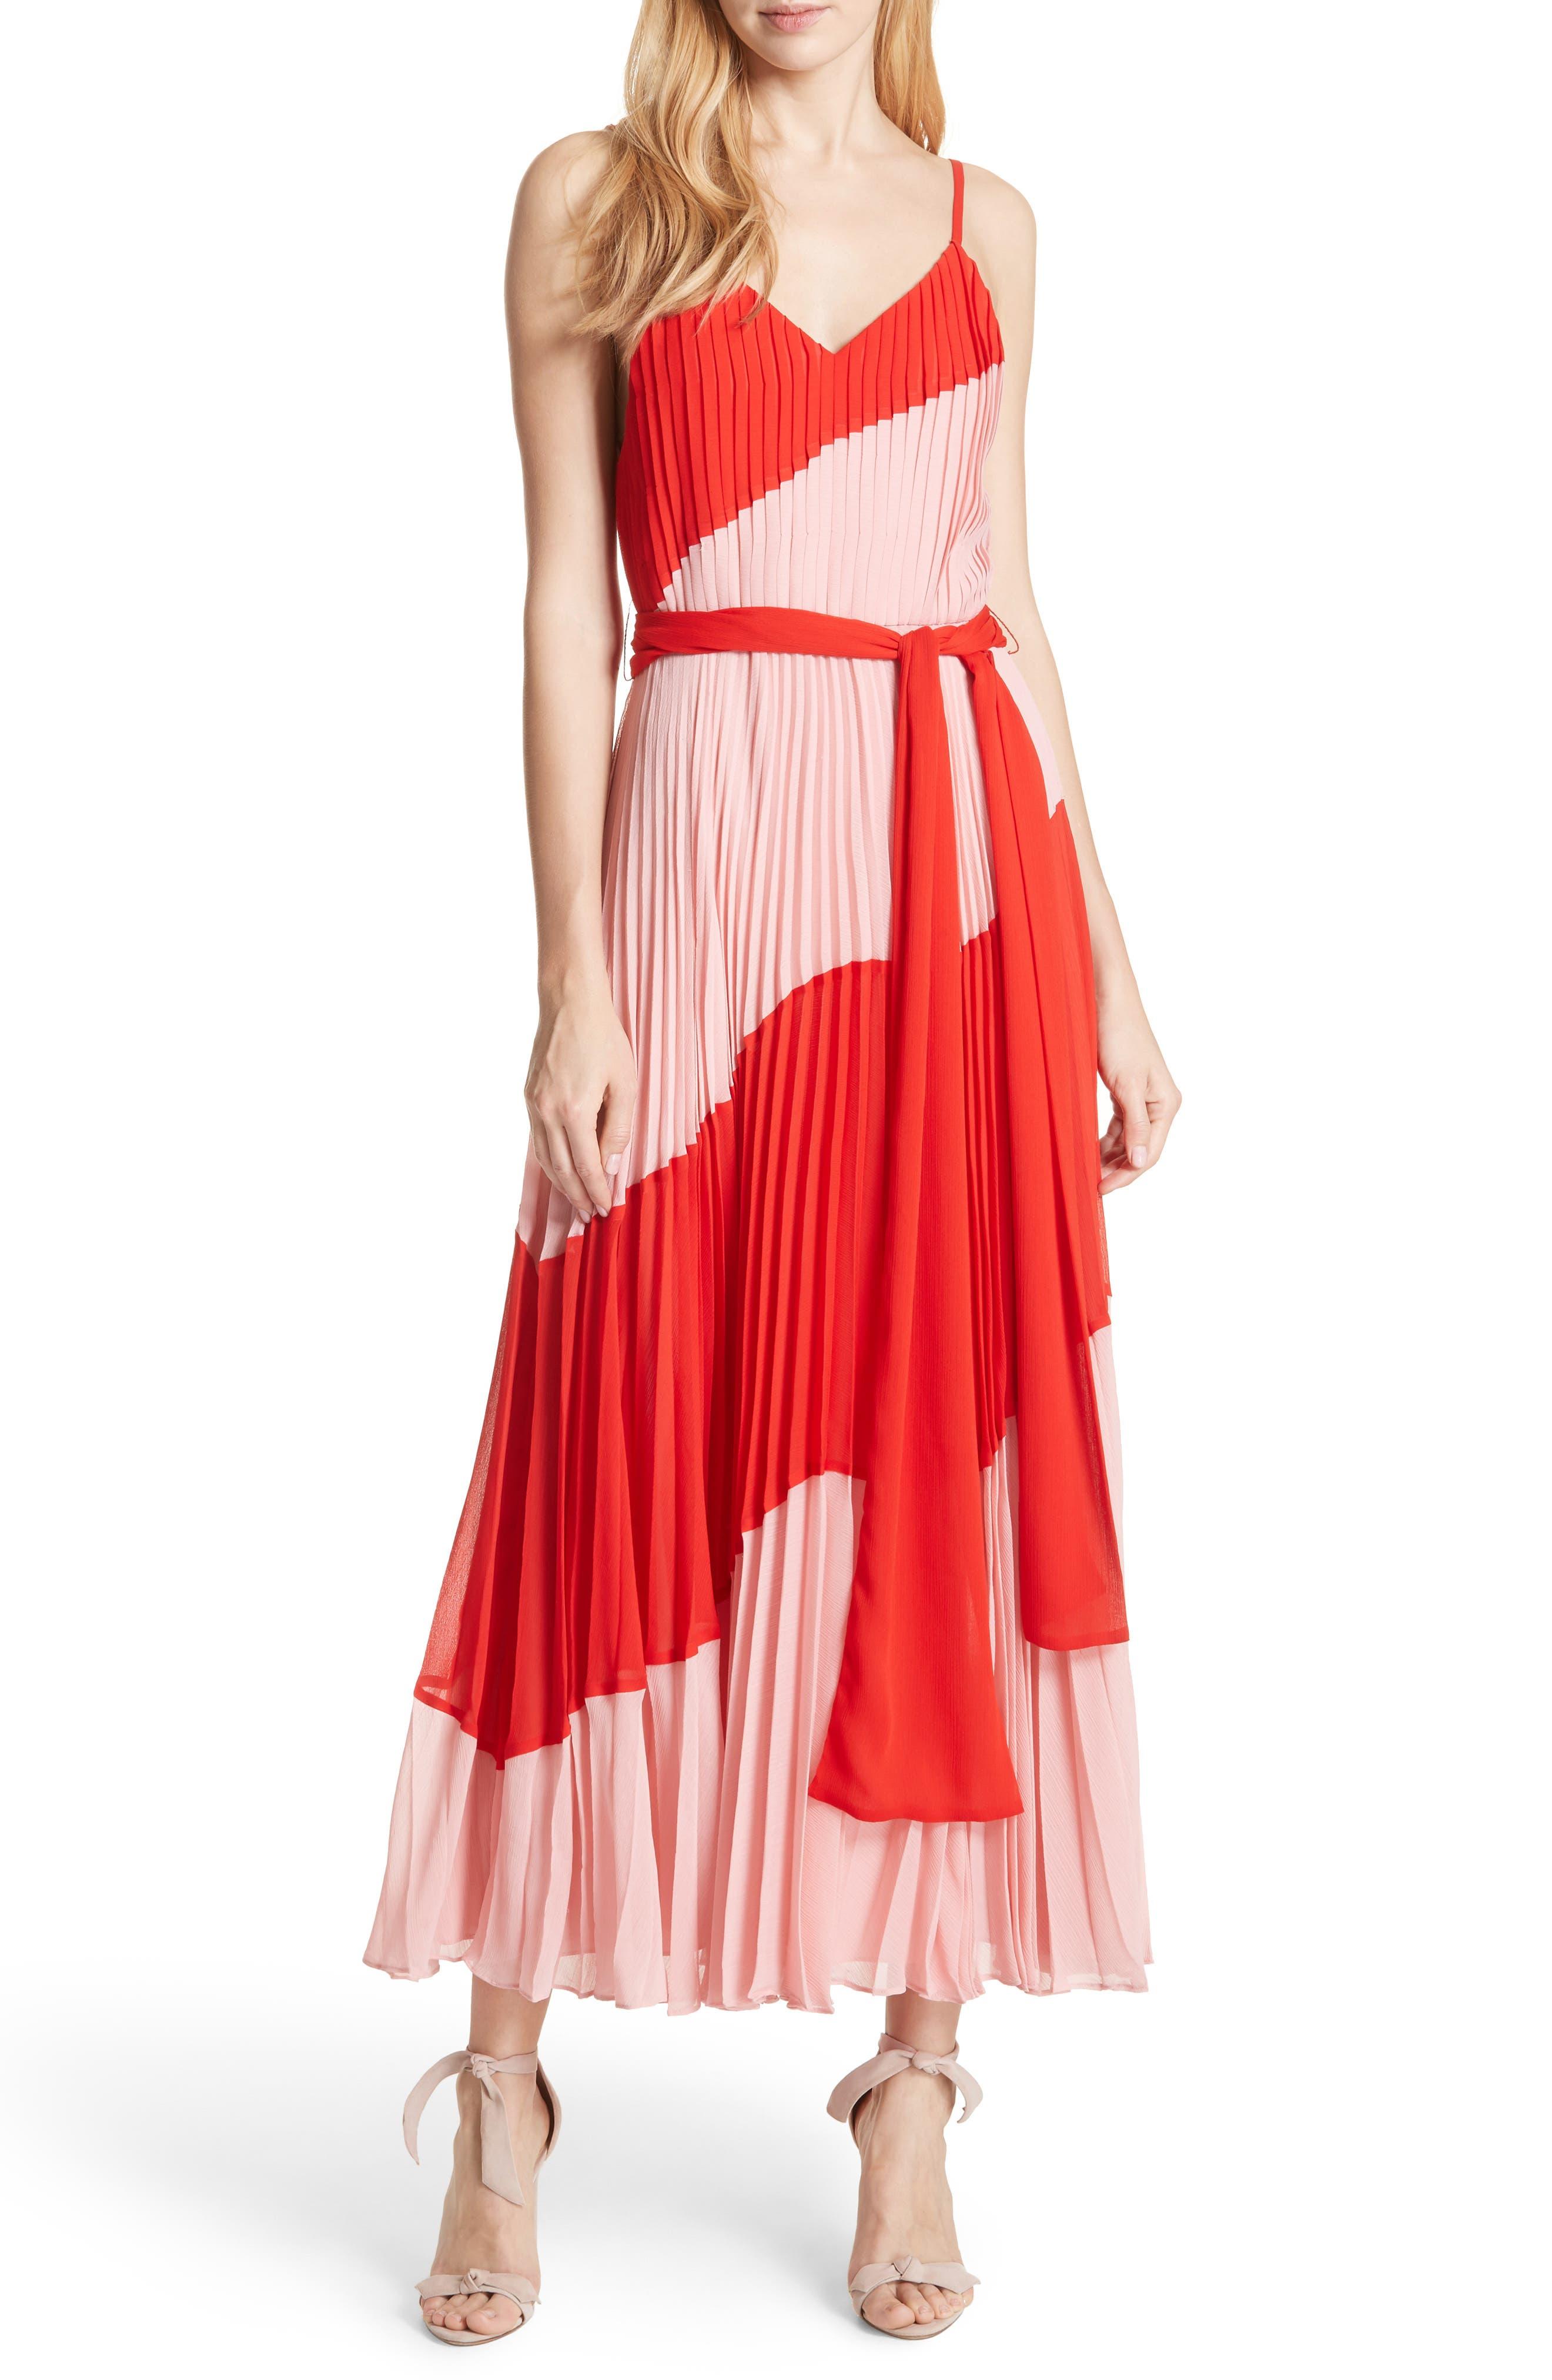 Main Image - Alice + Olivia Rozlyn Pleat Colorblock Maxi Dress